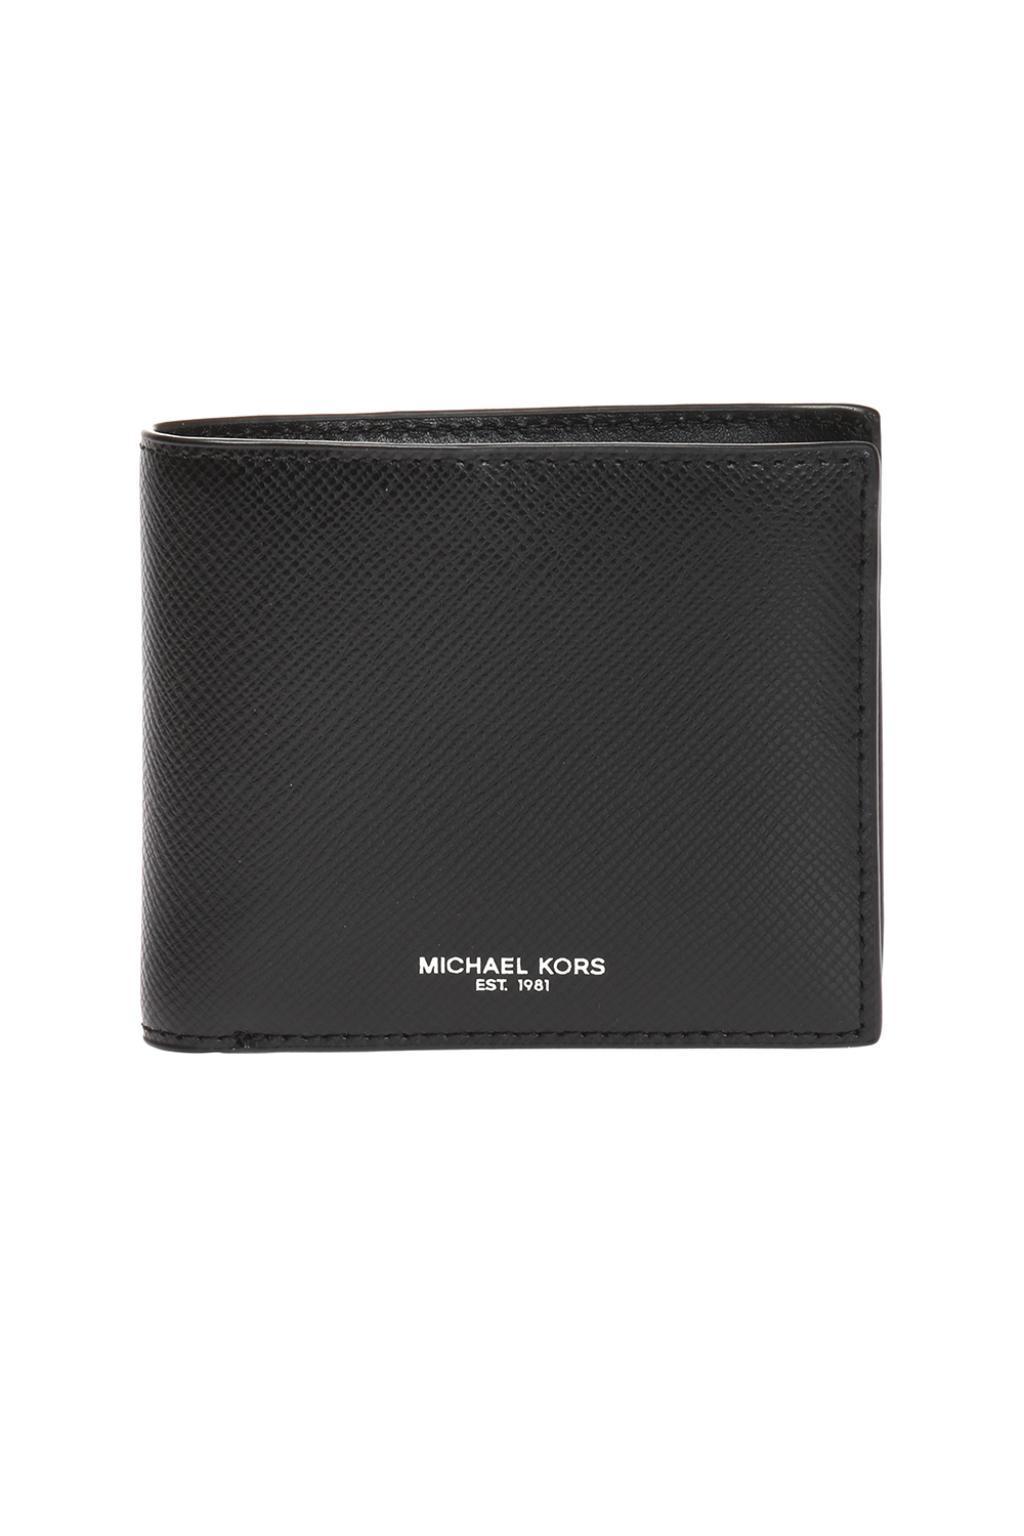 8e1b26ae7bc3 Michael Kors 'harrison' Fold Over Wallet in Black for Men - Save 12 ...